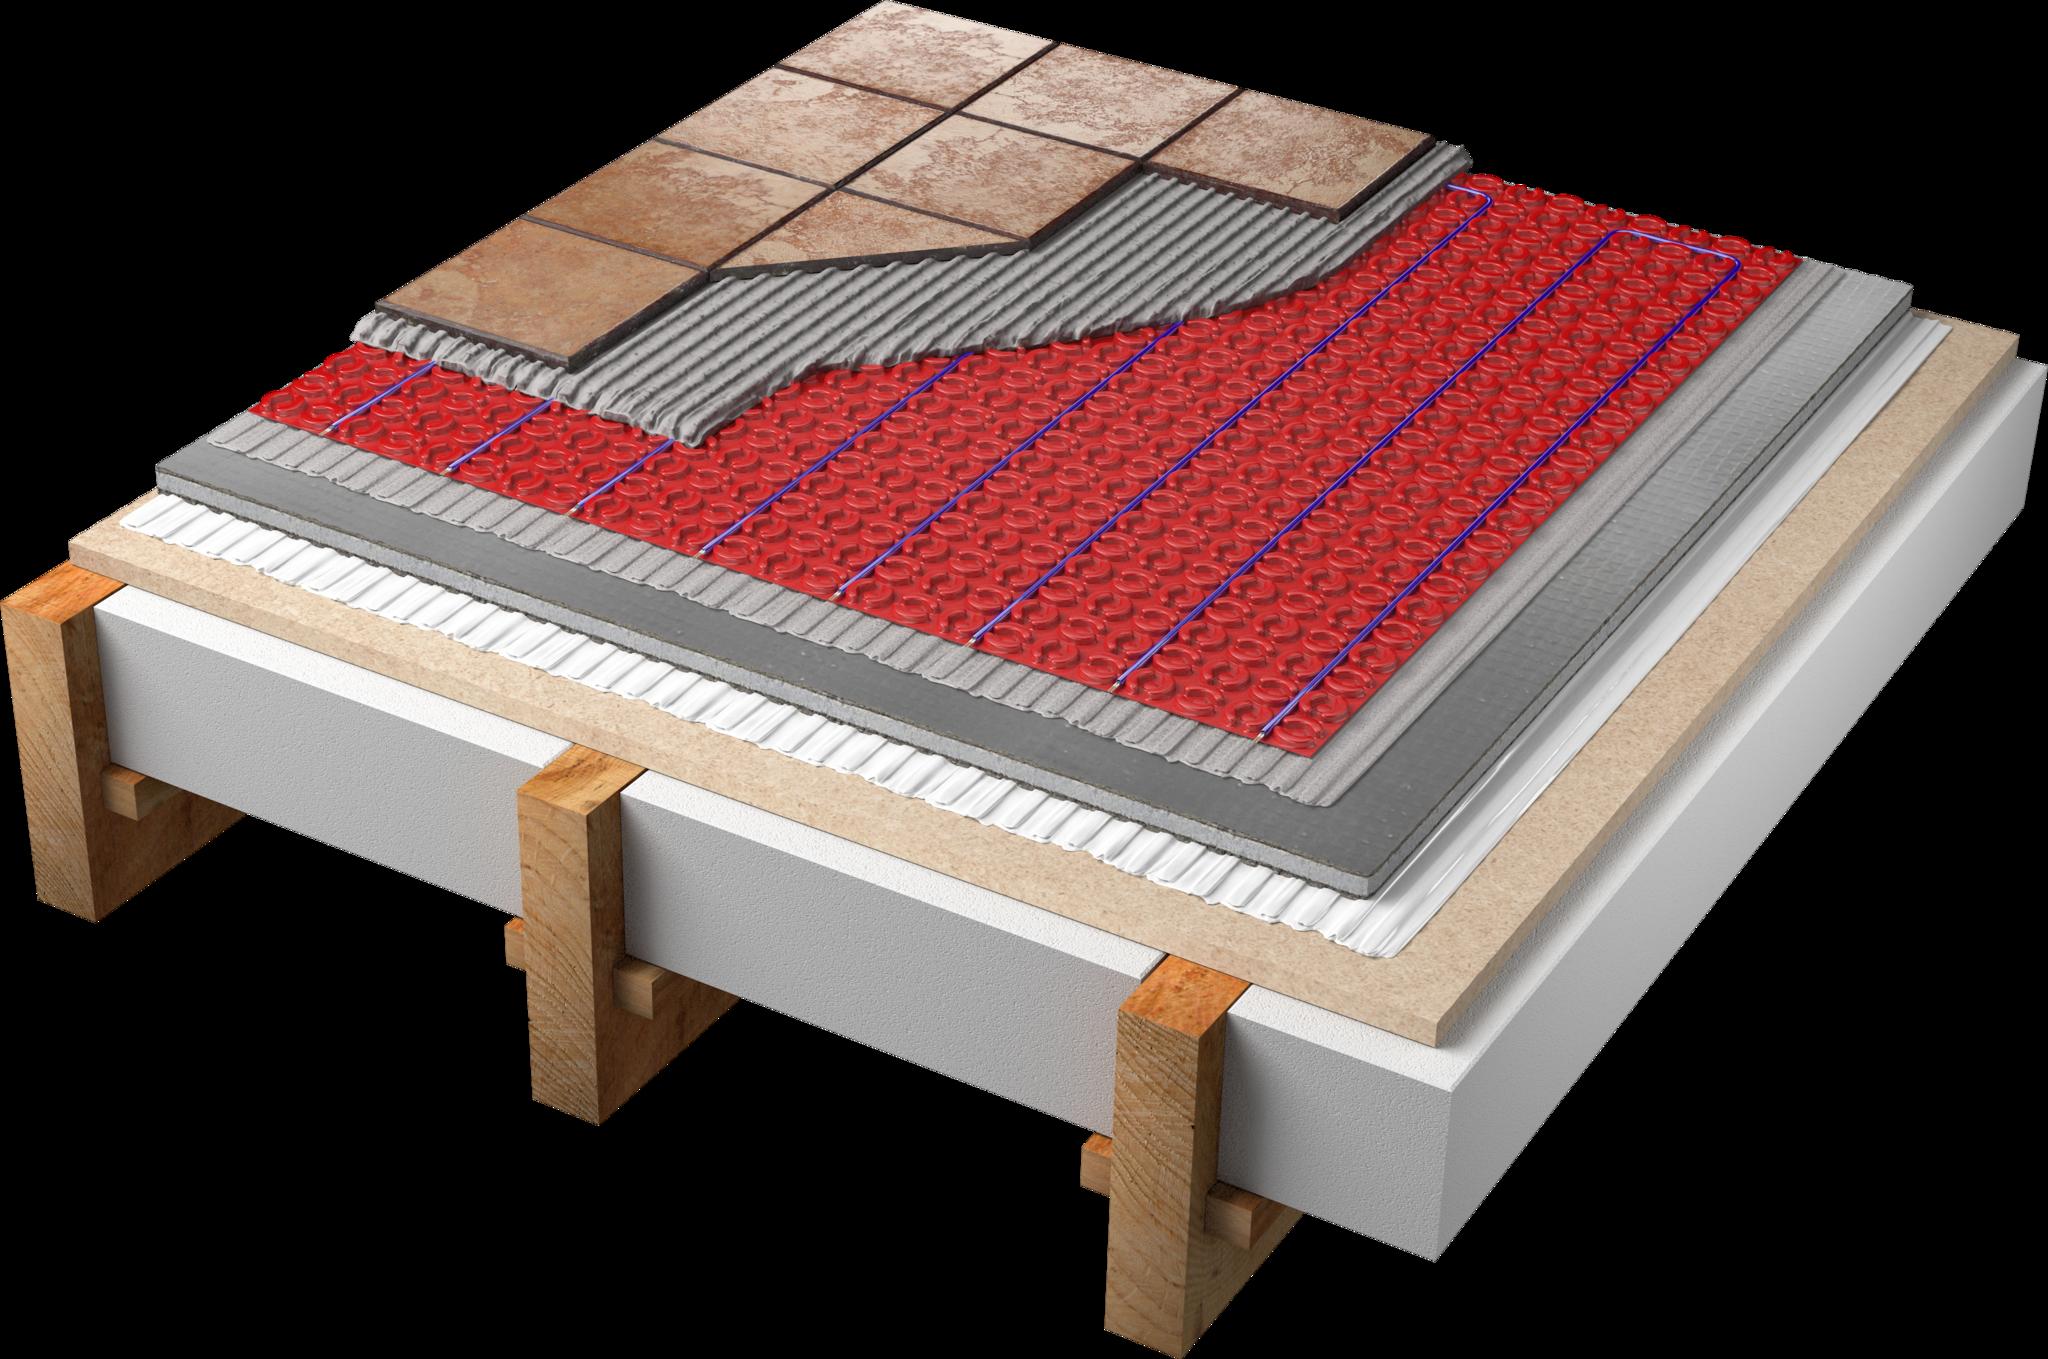 DCM-PRO vloerverwarming van Warmup